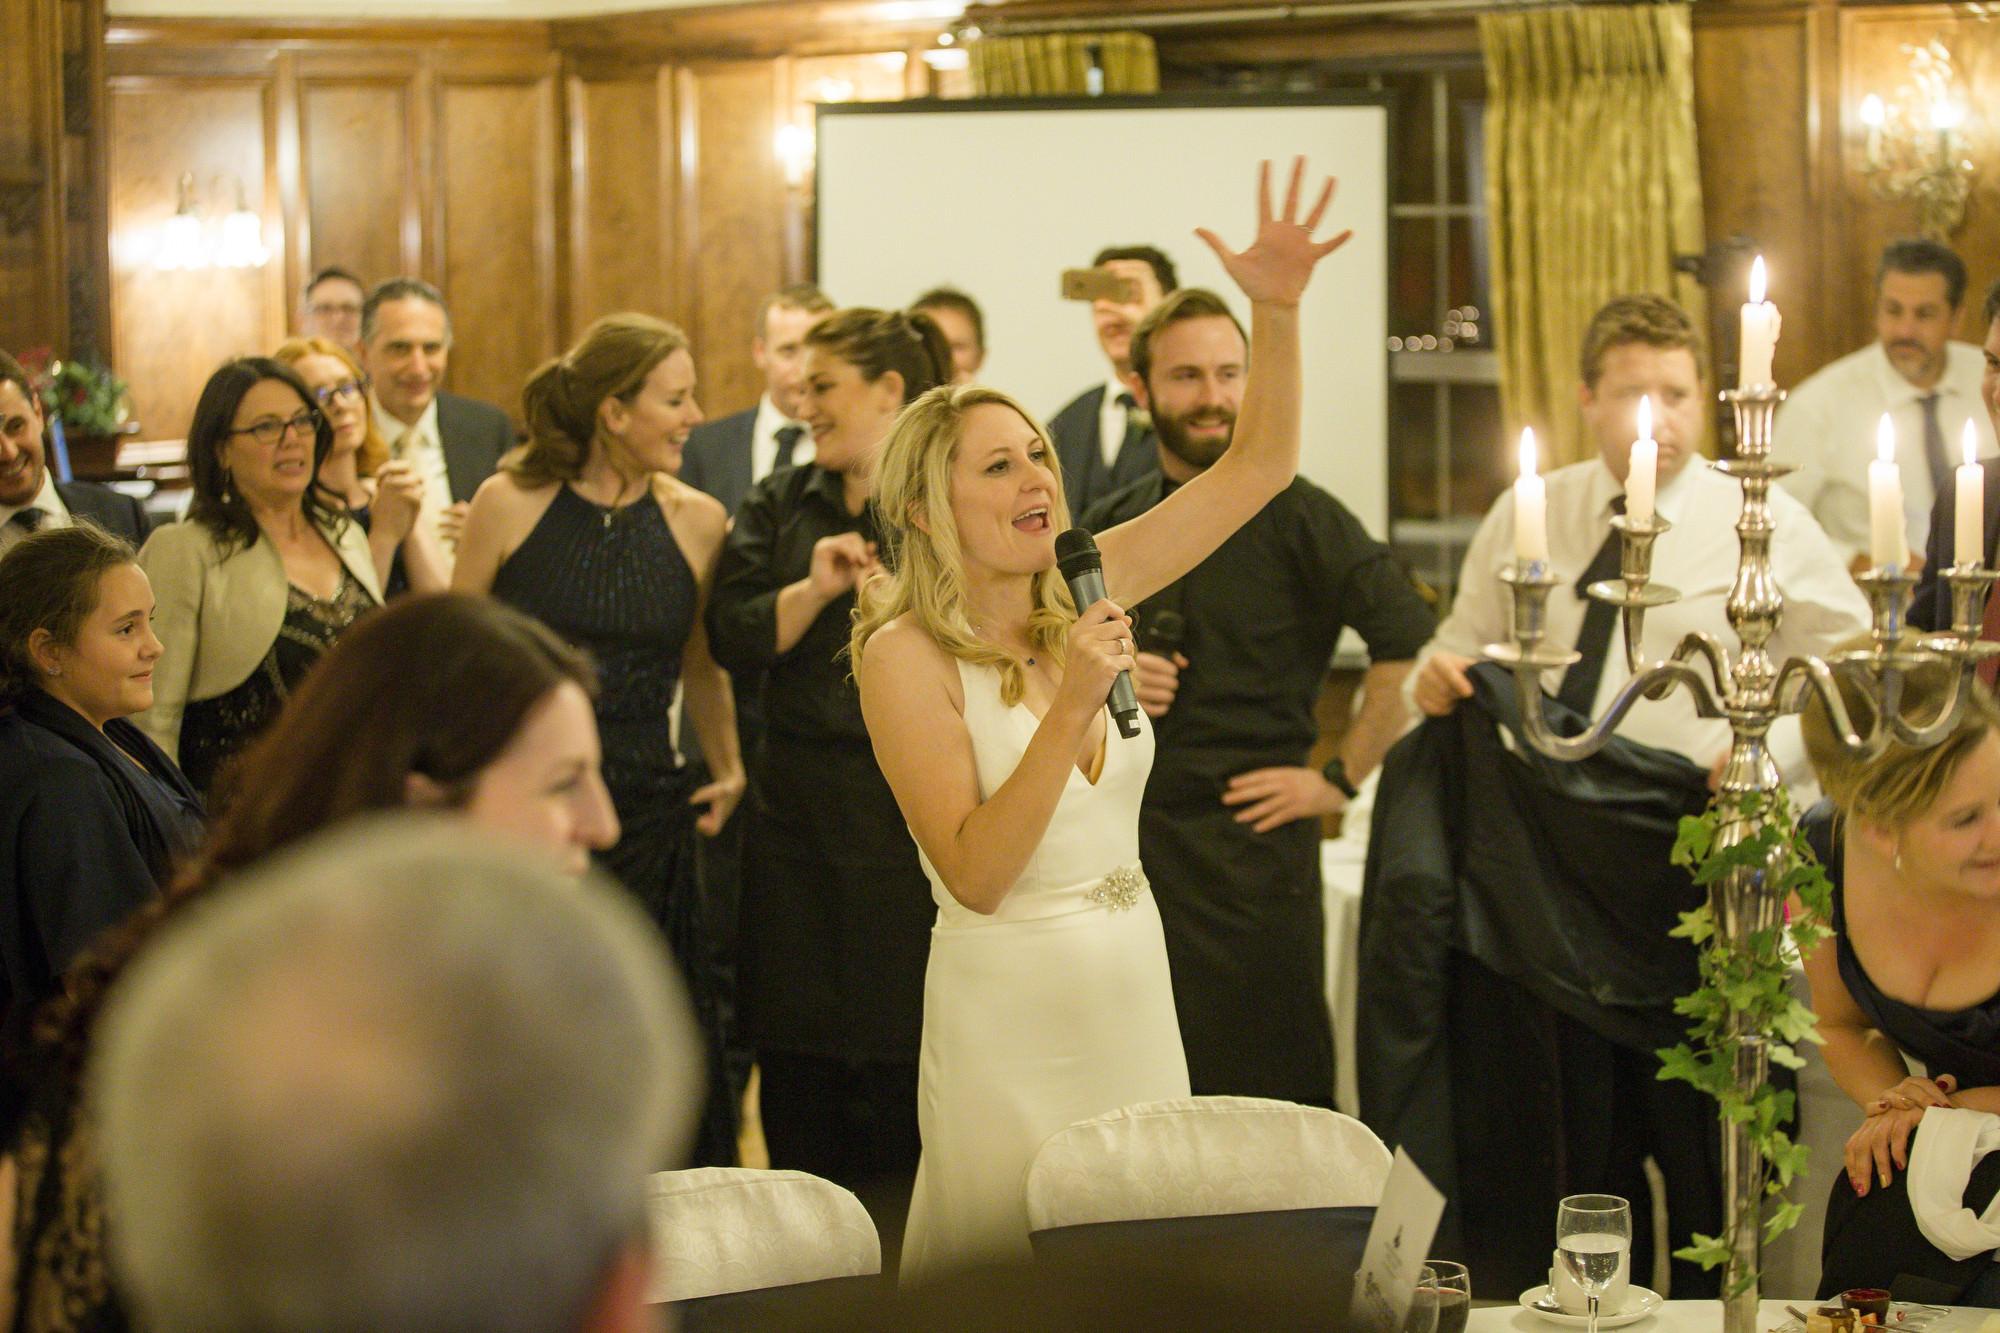 muckross_park_hotel_grougane_barra_wedding_photographer_goldenmoments_079.jpg